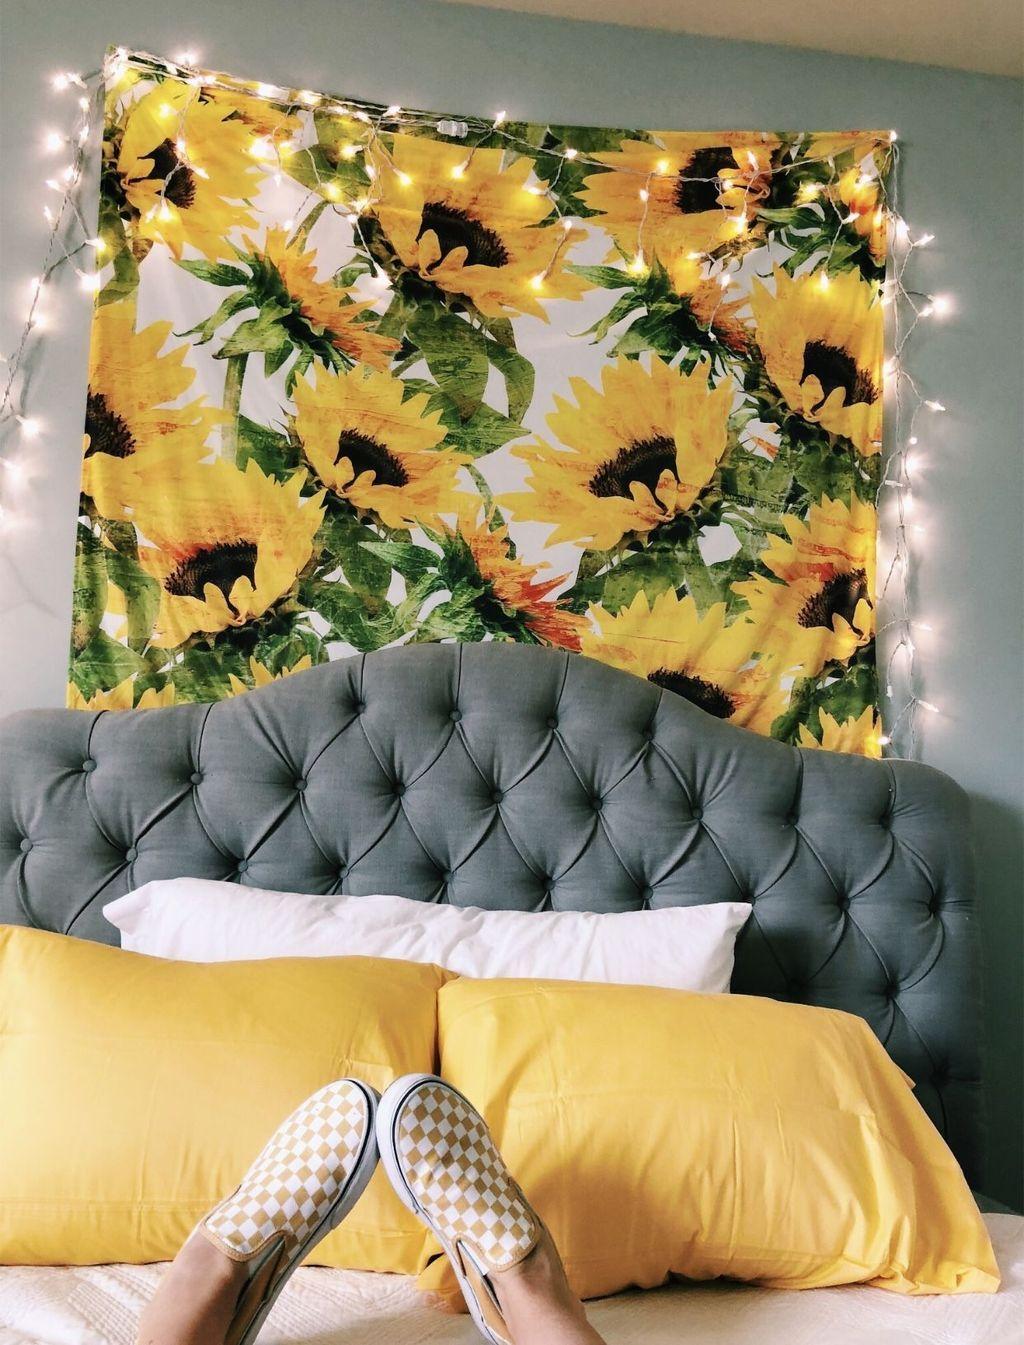 56 Incredible Yellow Aesthetic Room Decor Ideas Aesthetic Room Decor Aesthetic Rooms Yellow Room